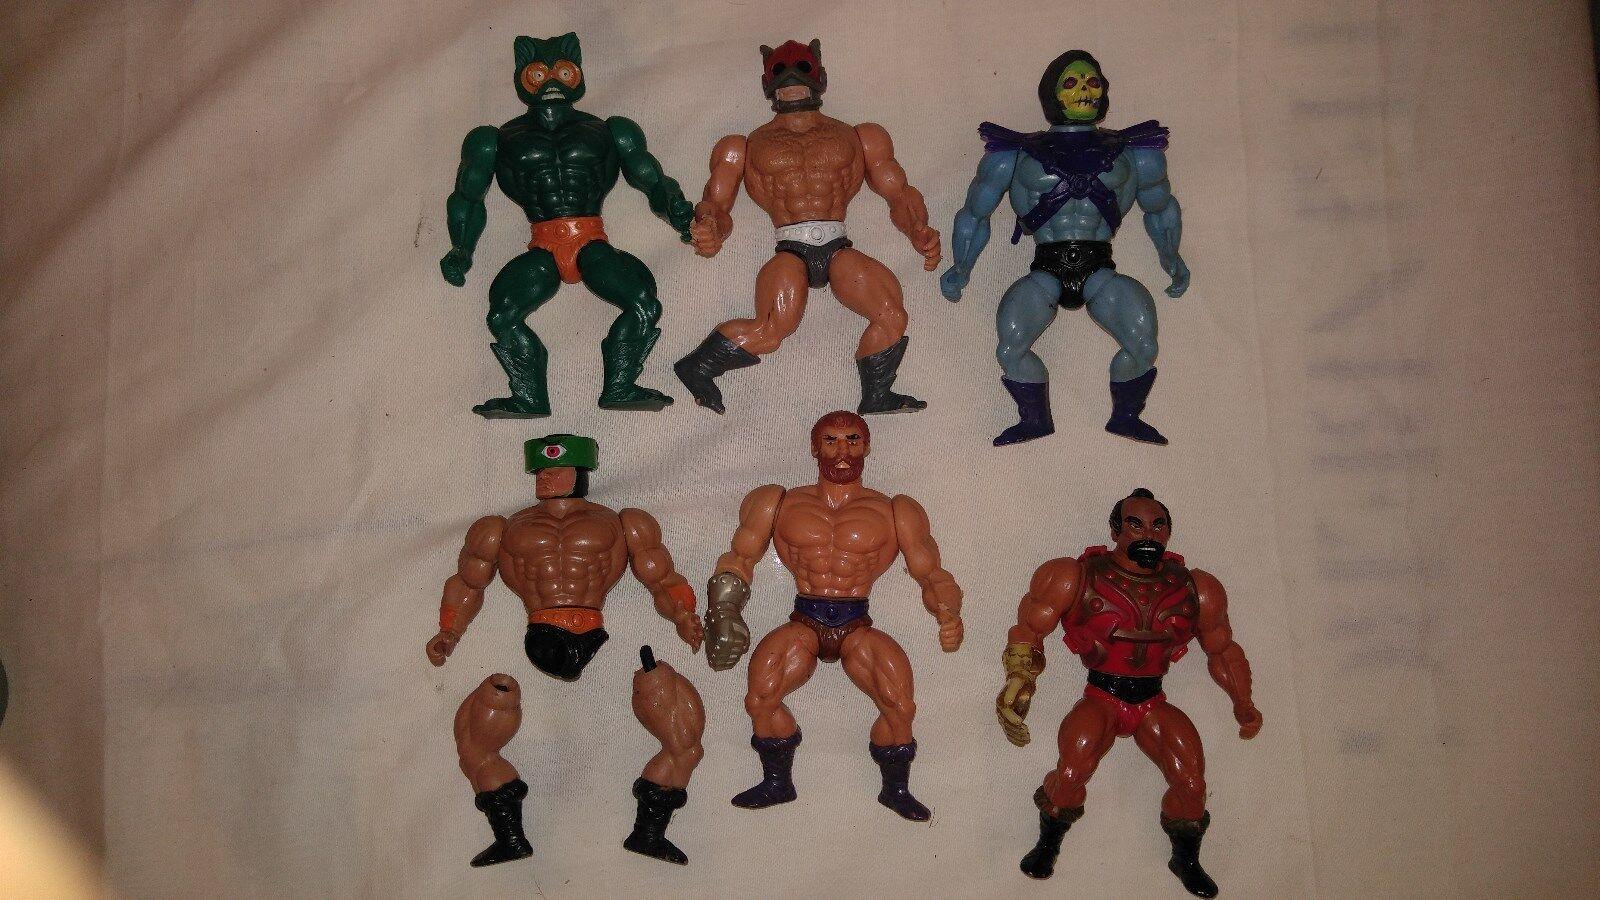 6 Masters of the Universe Lot Skeletor, Mer-man, Fisto, Zodac, Tri-Klops, Jitsu